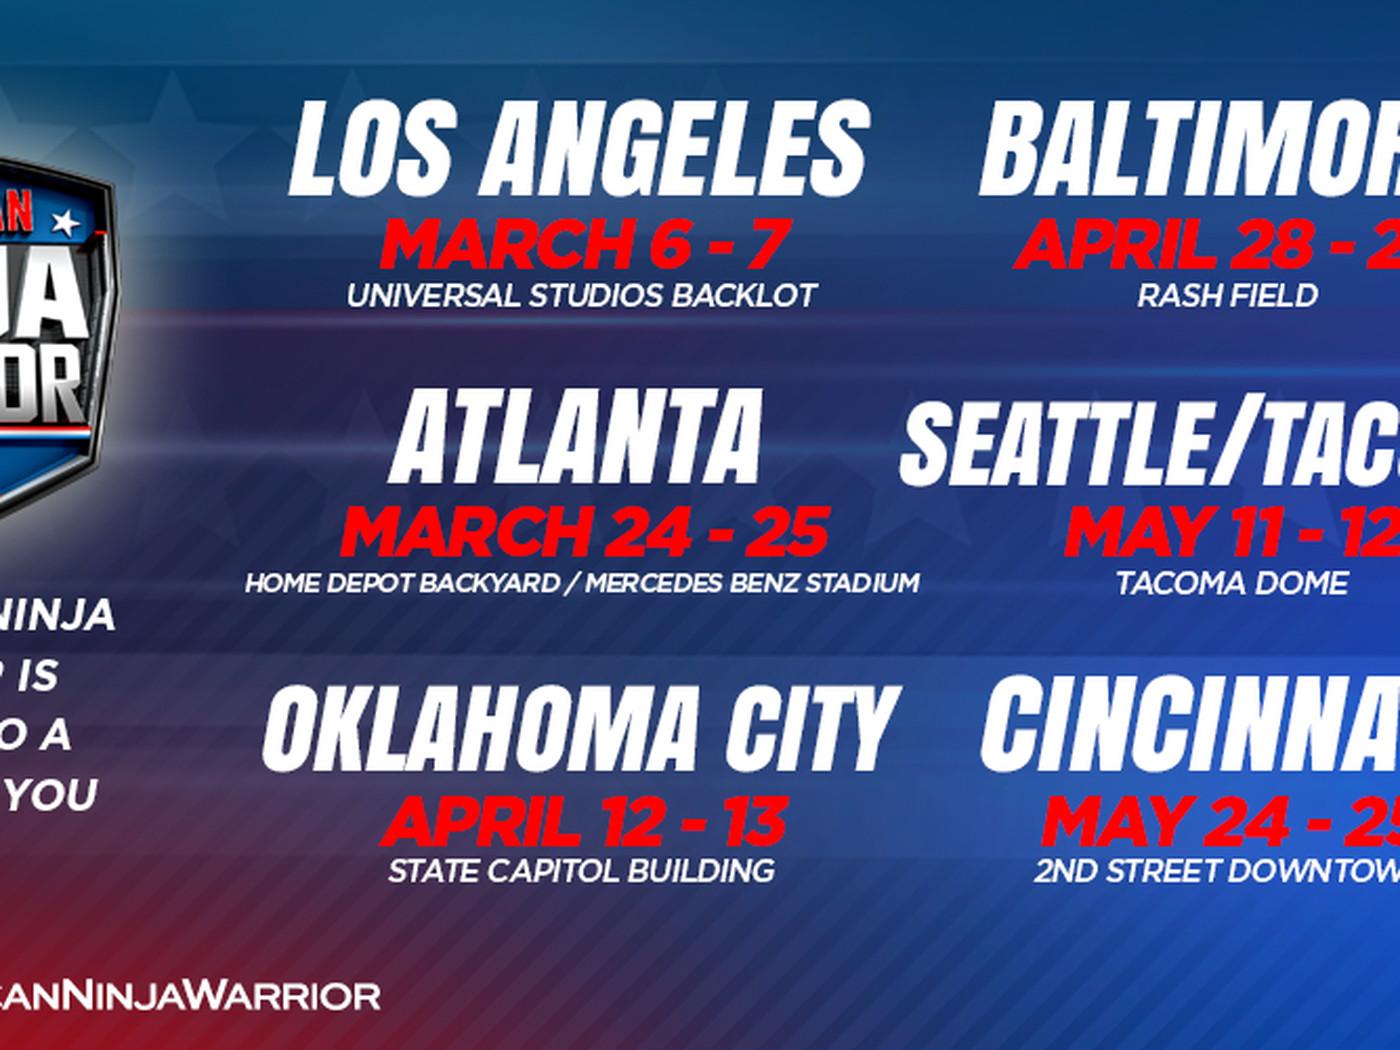 American Ninja Warrior: Season 11 locations and taping dates